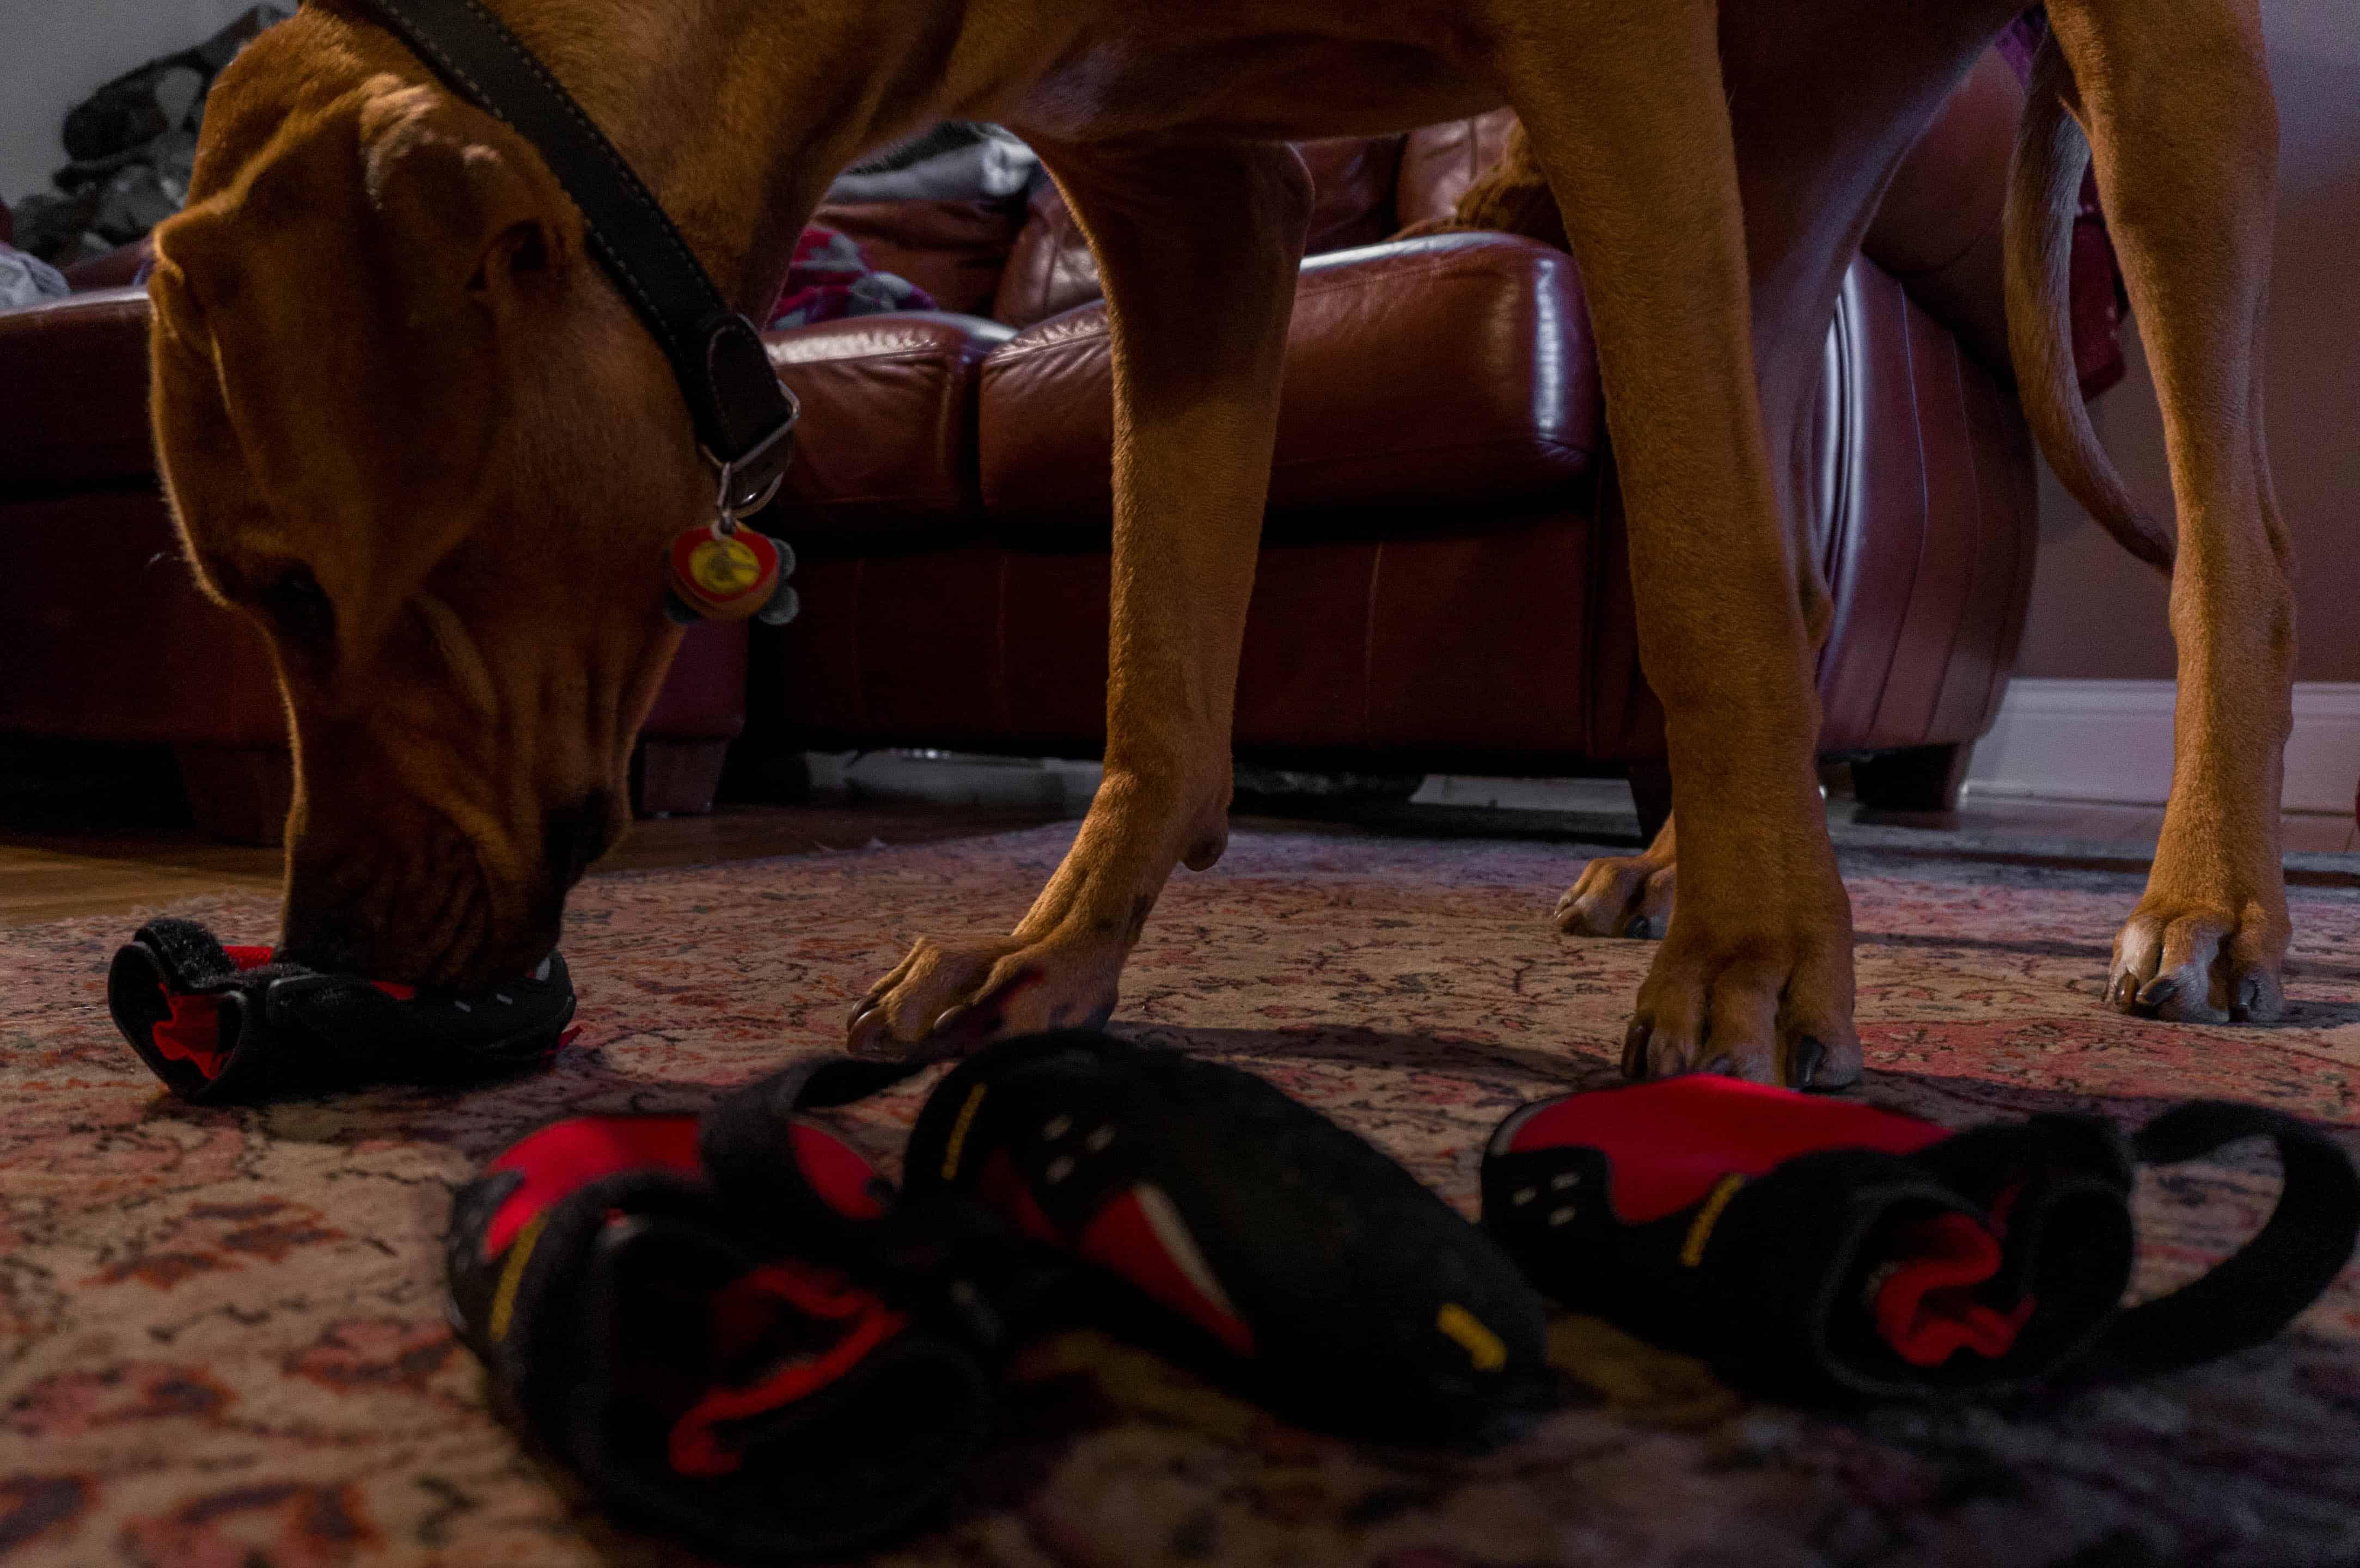 Rhodesian Ridgeback, adventure, dog blog, dogs, photos, pets, adventure, chicago, winter, dog boots